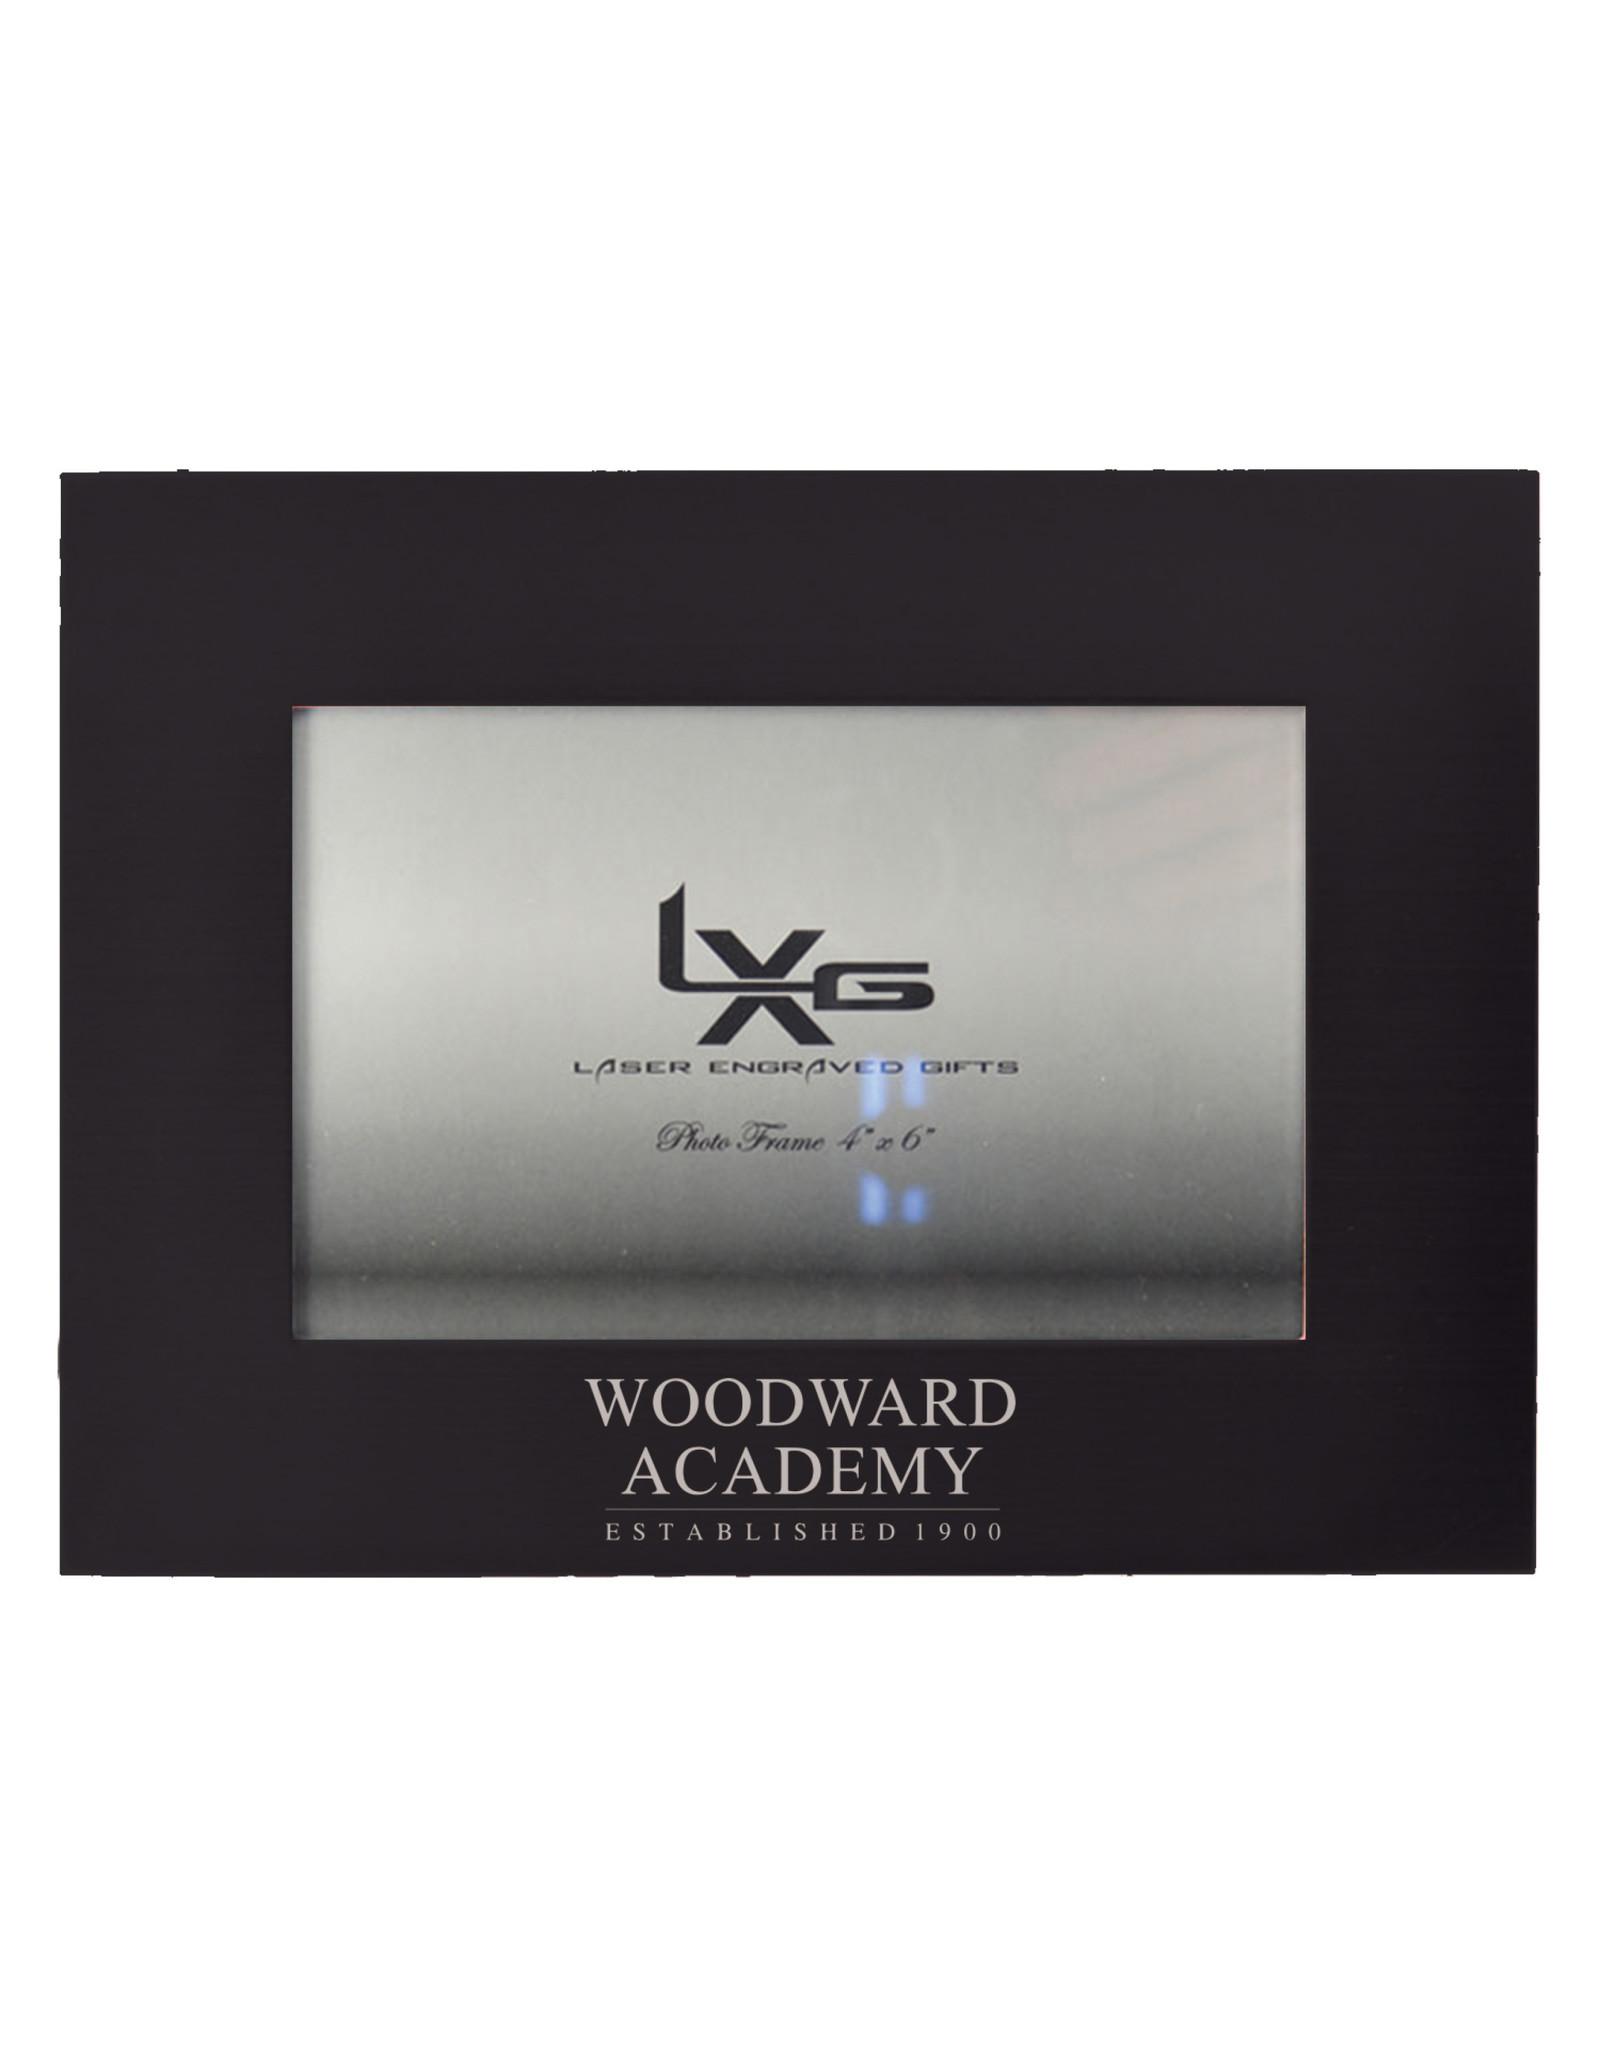 LXG Frame - 4x6 Black Matte by LXG